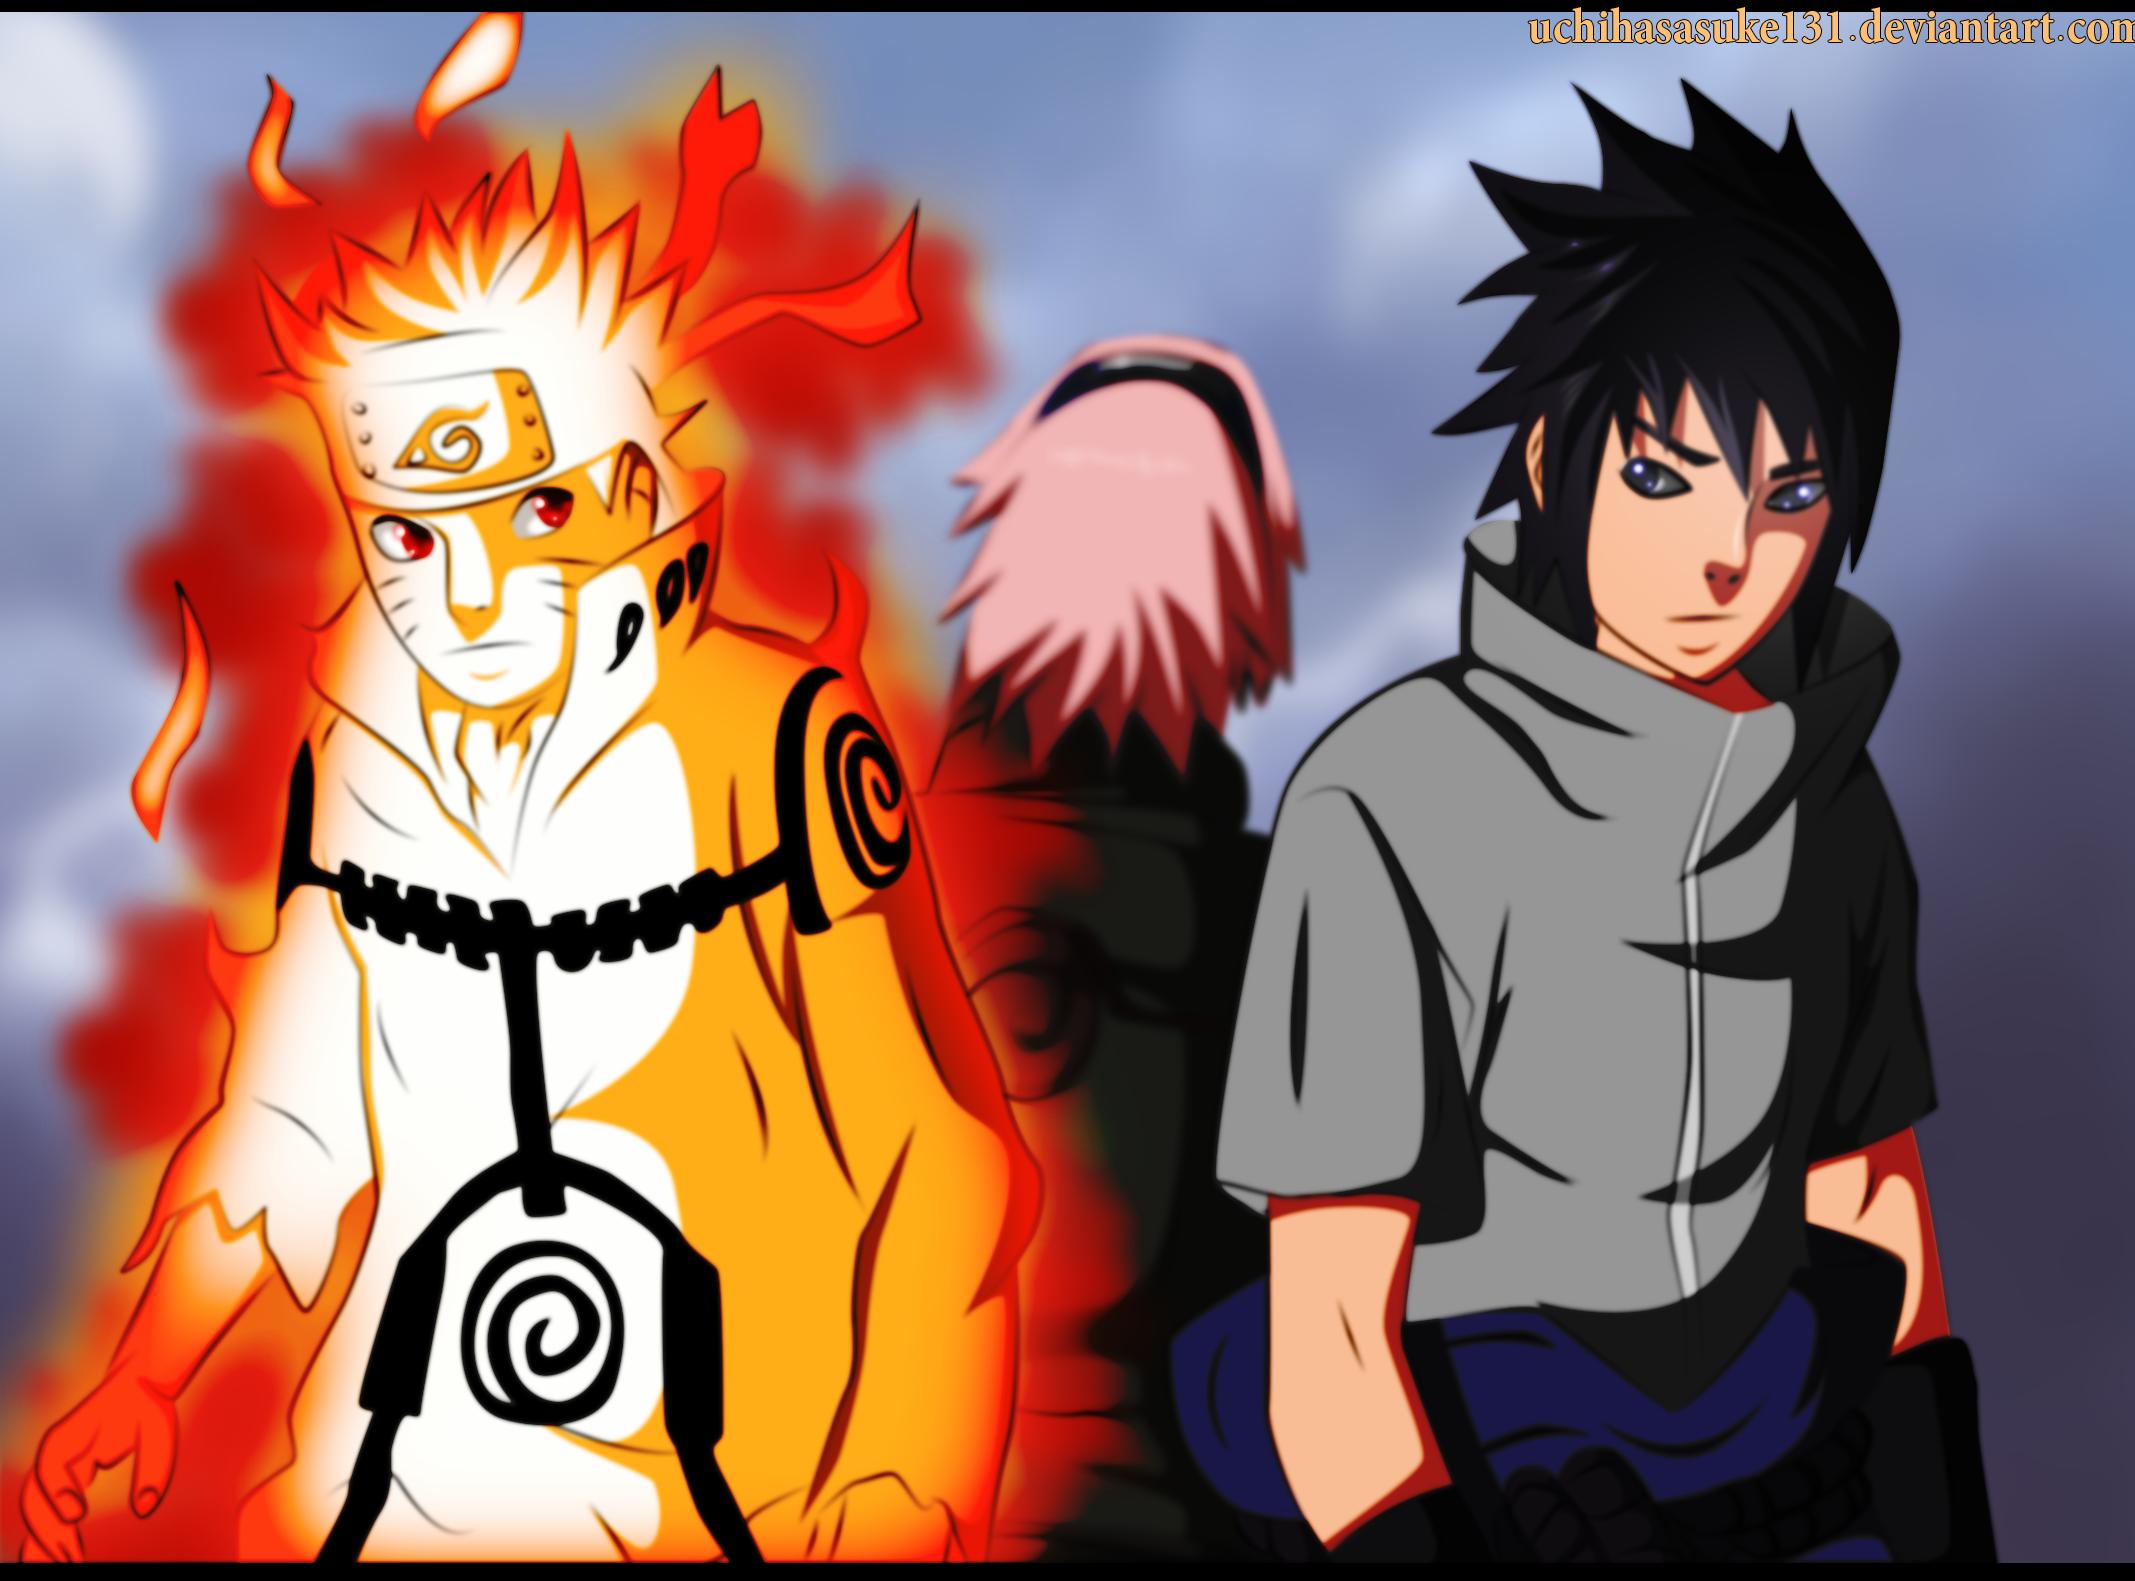 Most Inspiring Wallpaper Naruto Team 7 - naruto_633_coloring___team_7_by_uchihasasuke131-d67w3di  Graphic.png